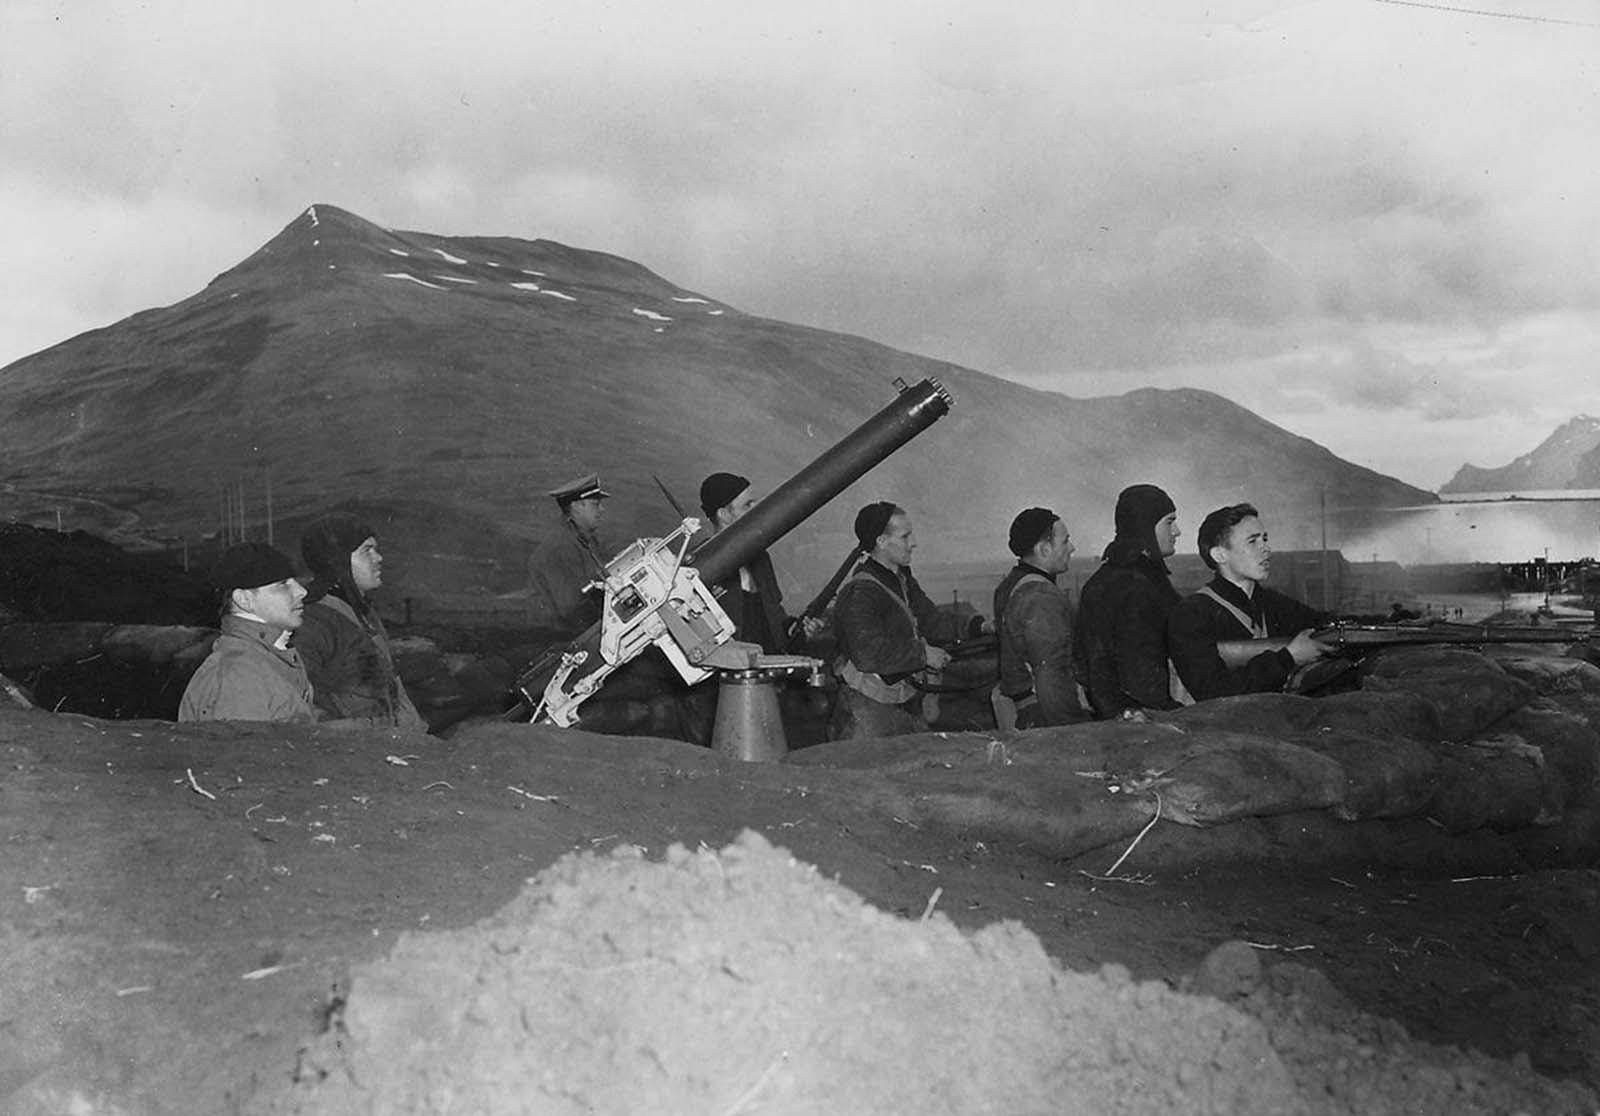 Defending Dutch Harbor, Alaska during the Japanese air attacks of June 3-4, 1942.